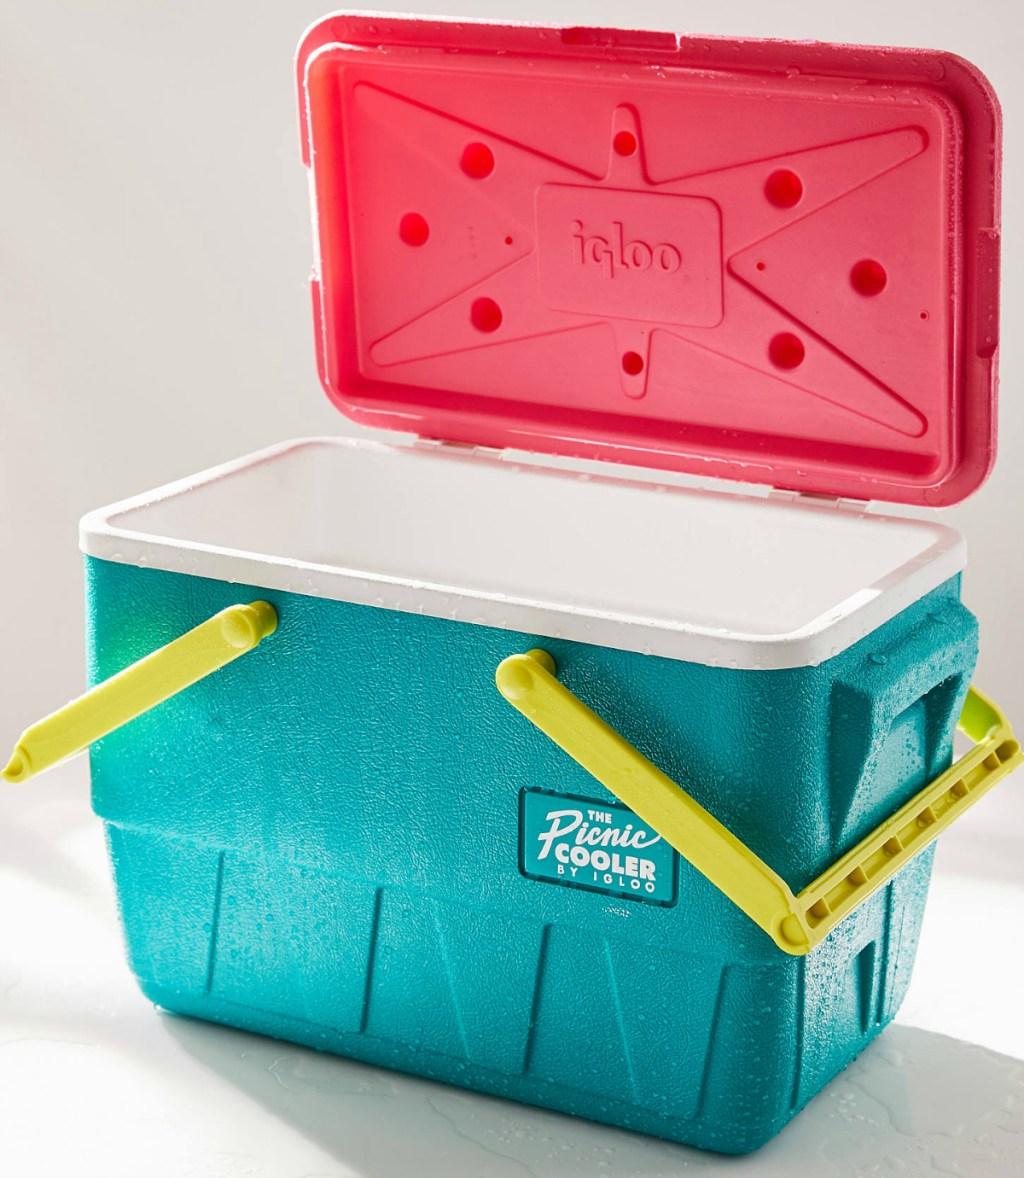 Igloo Retro Limited Edition Picnic Basket 25 Qt Cooler